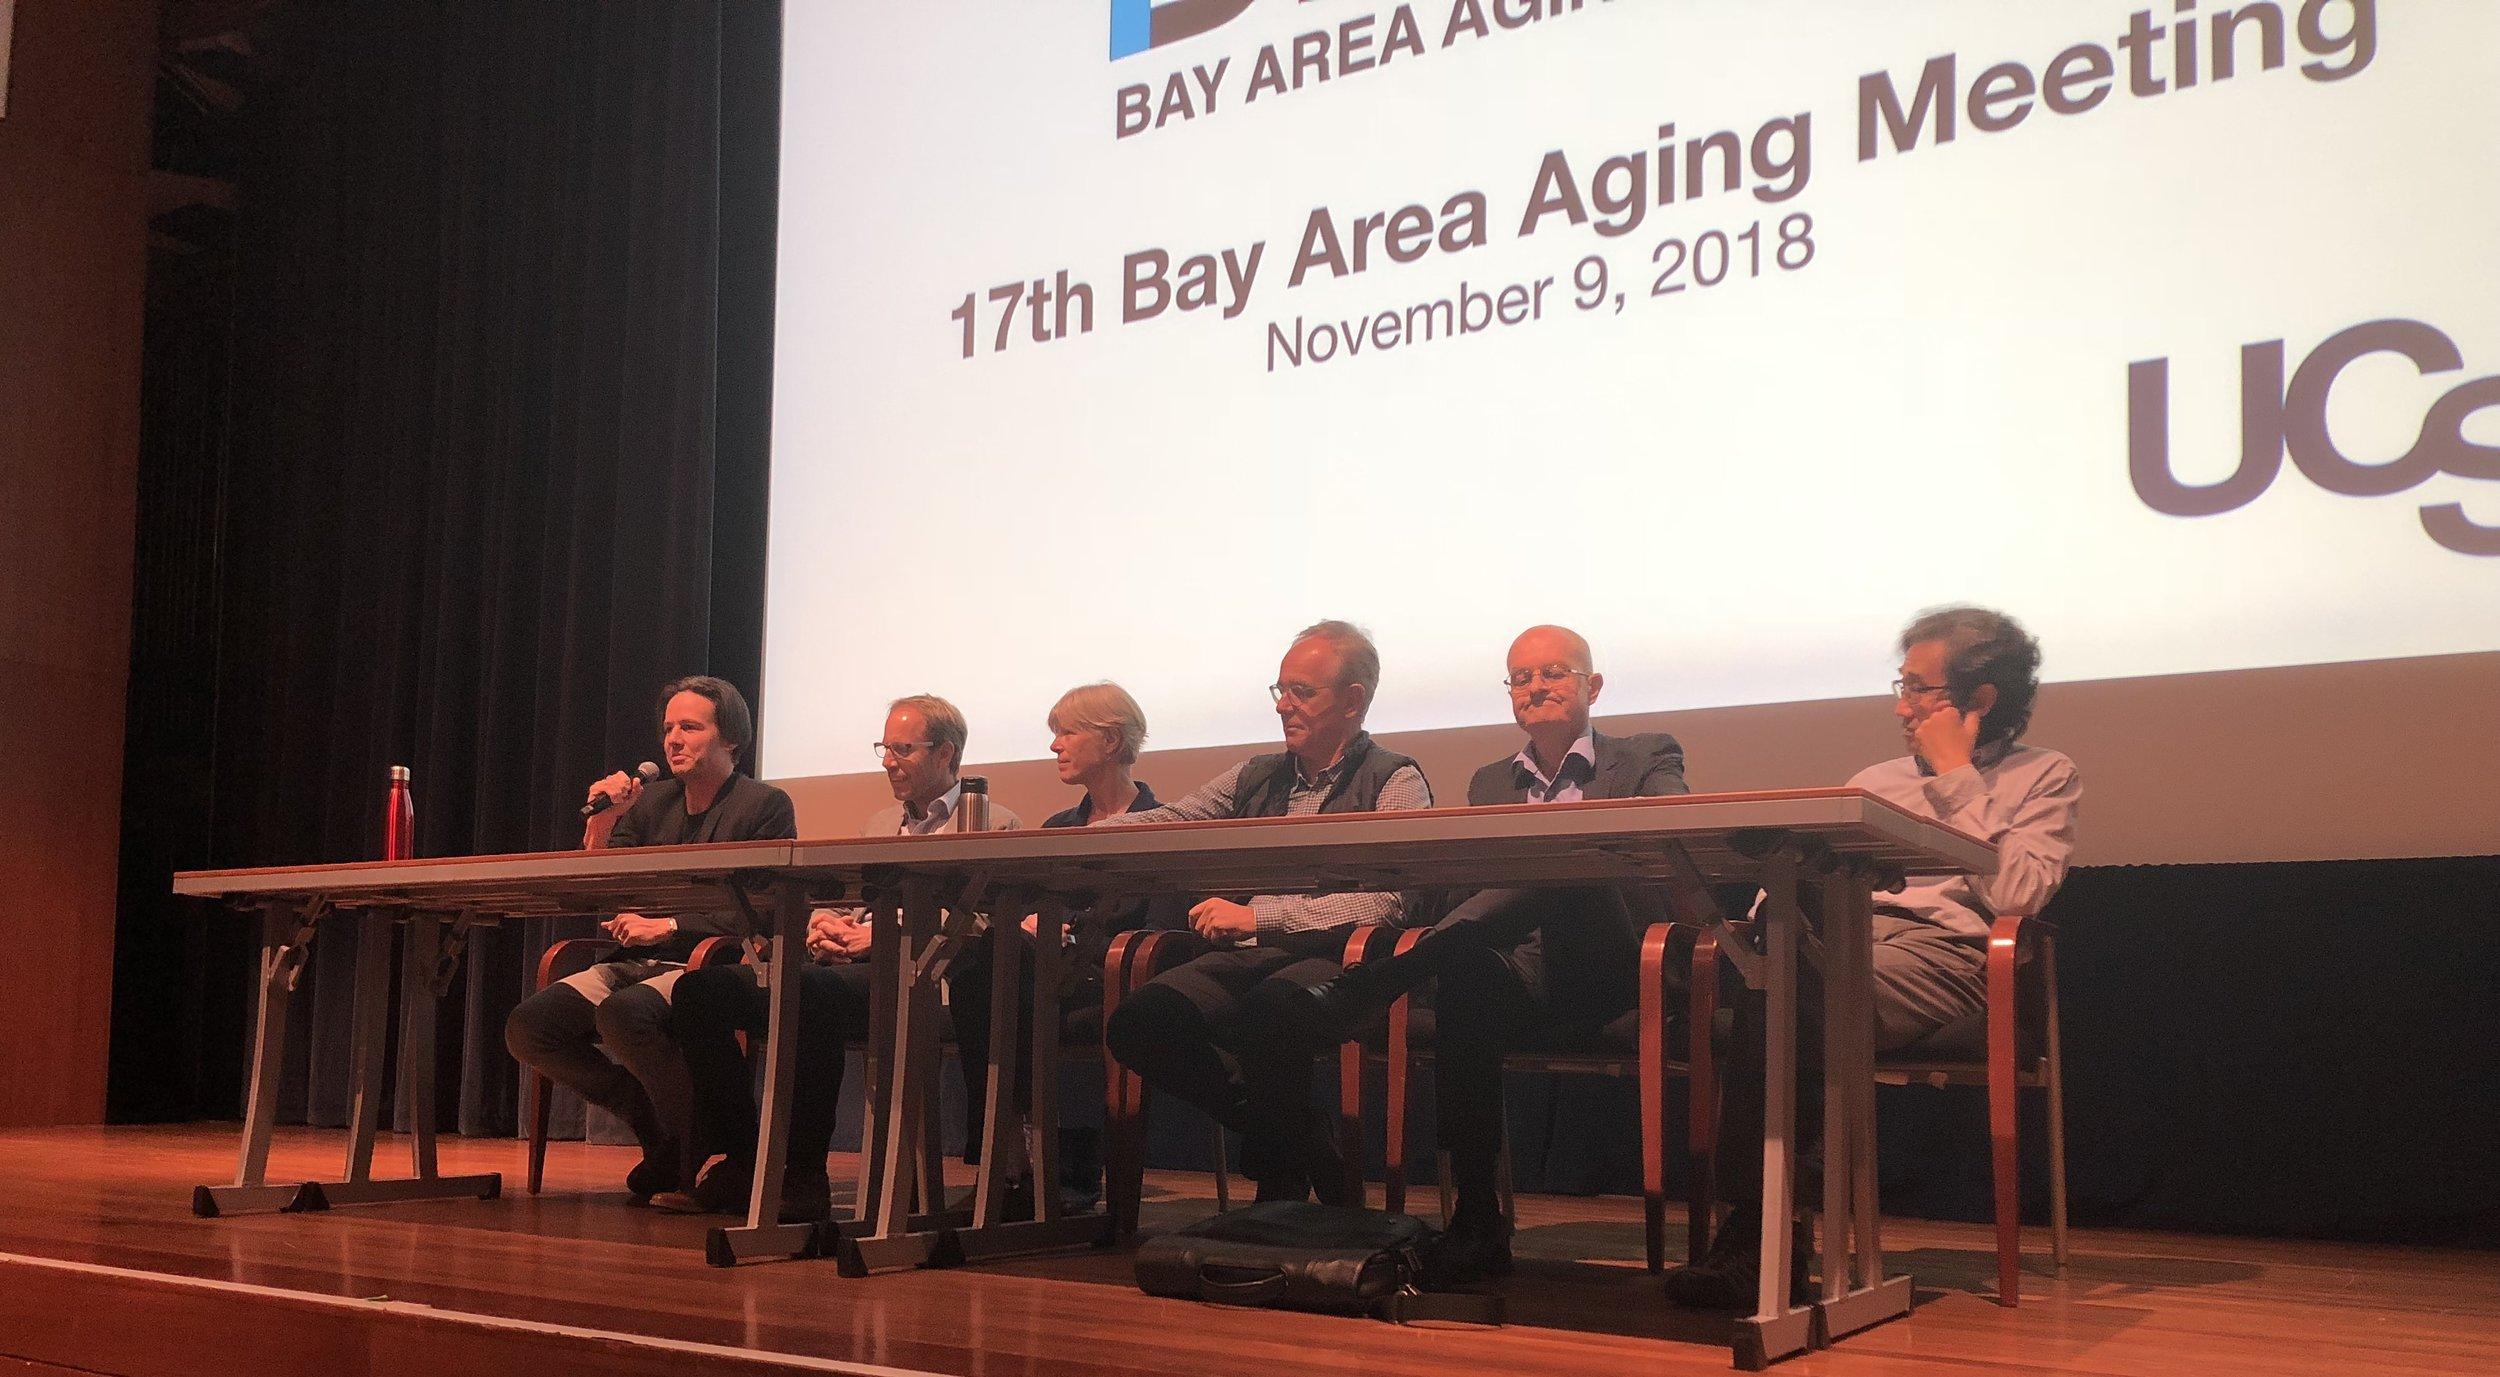 From left to right: Ned David, Tony Wyss-Coray, Cynthia Kenyon, Eric Verdin, Lenny Guarente, and Max Guo